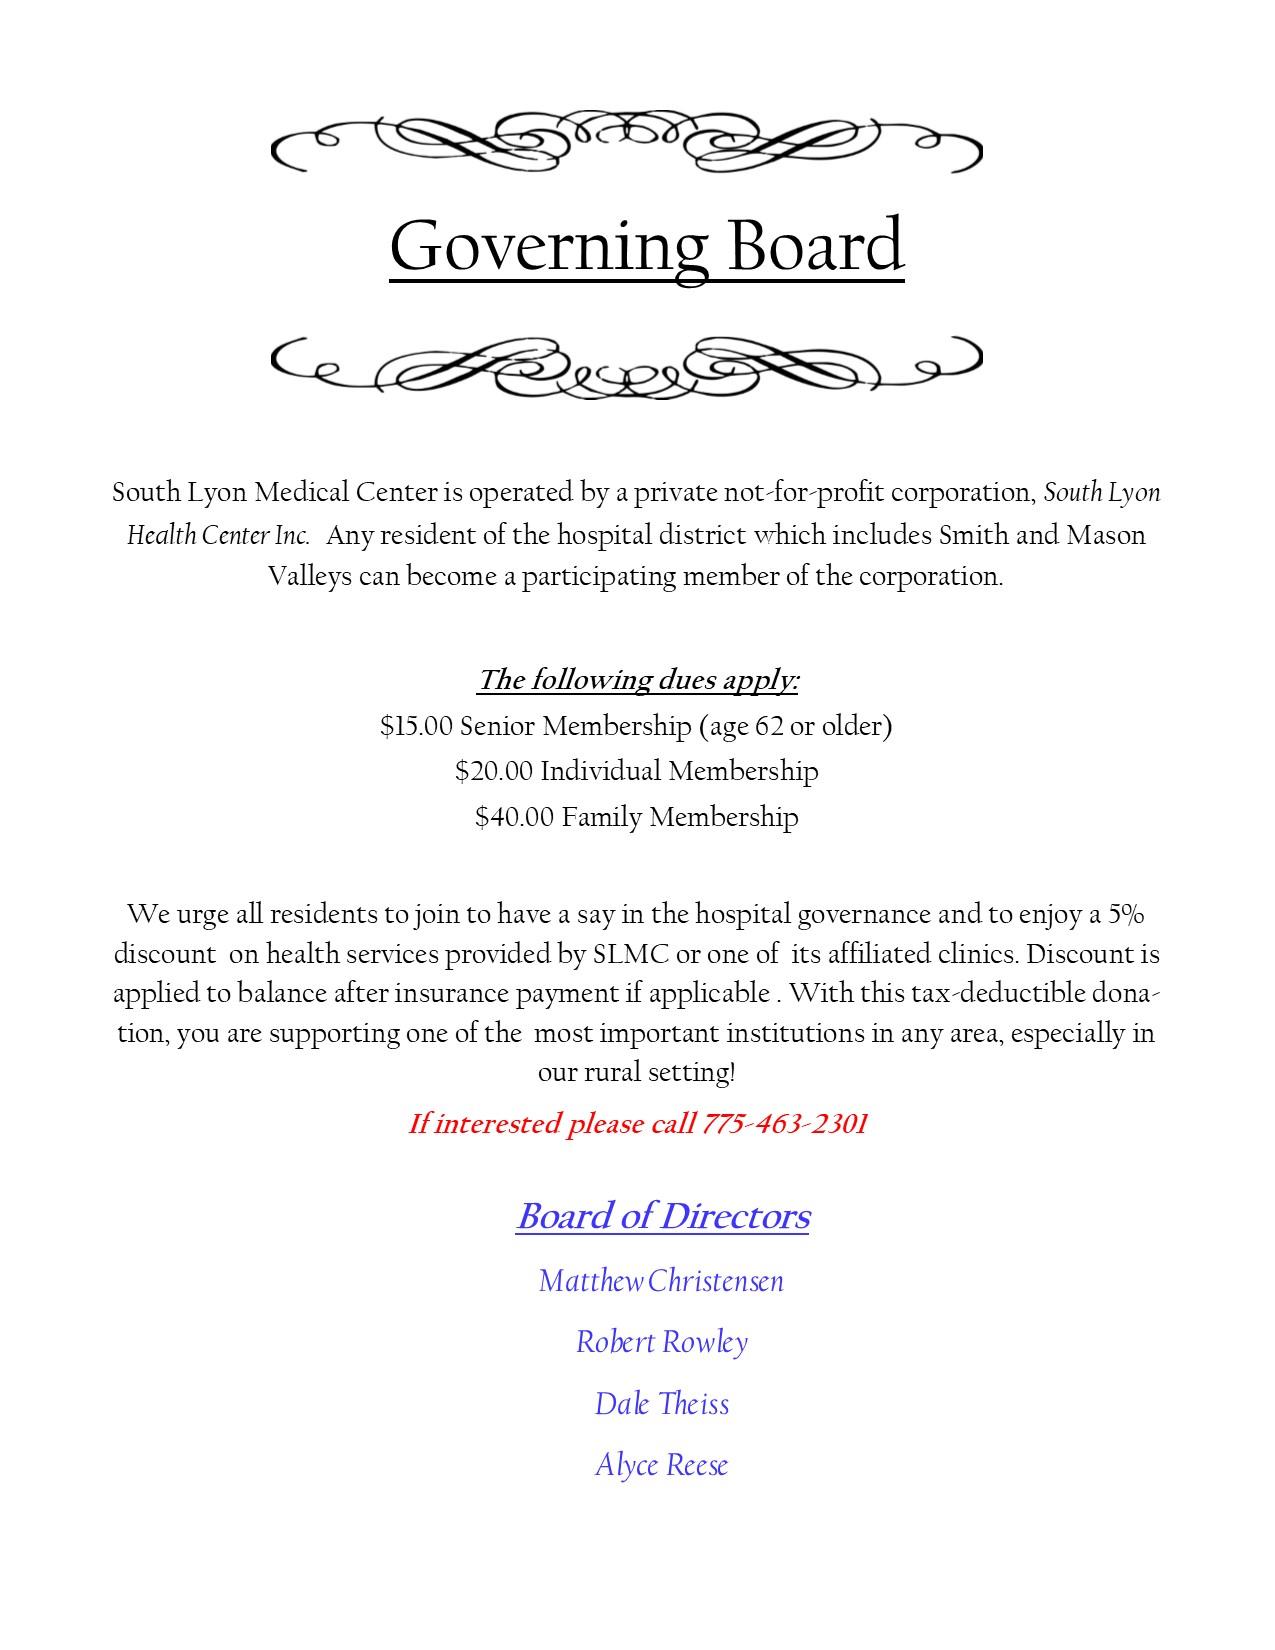 Governing Board board of directors